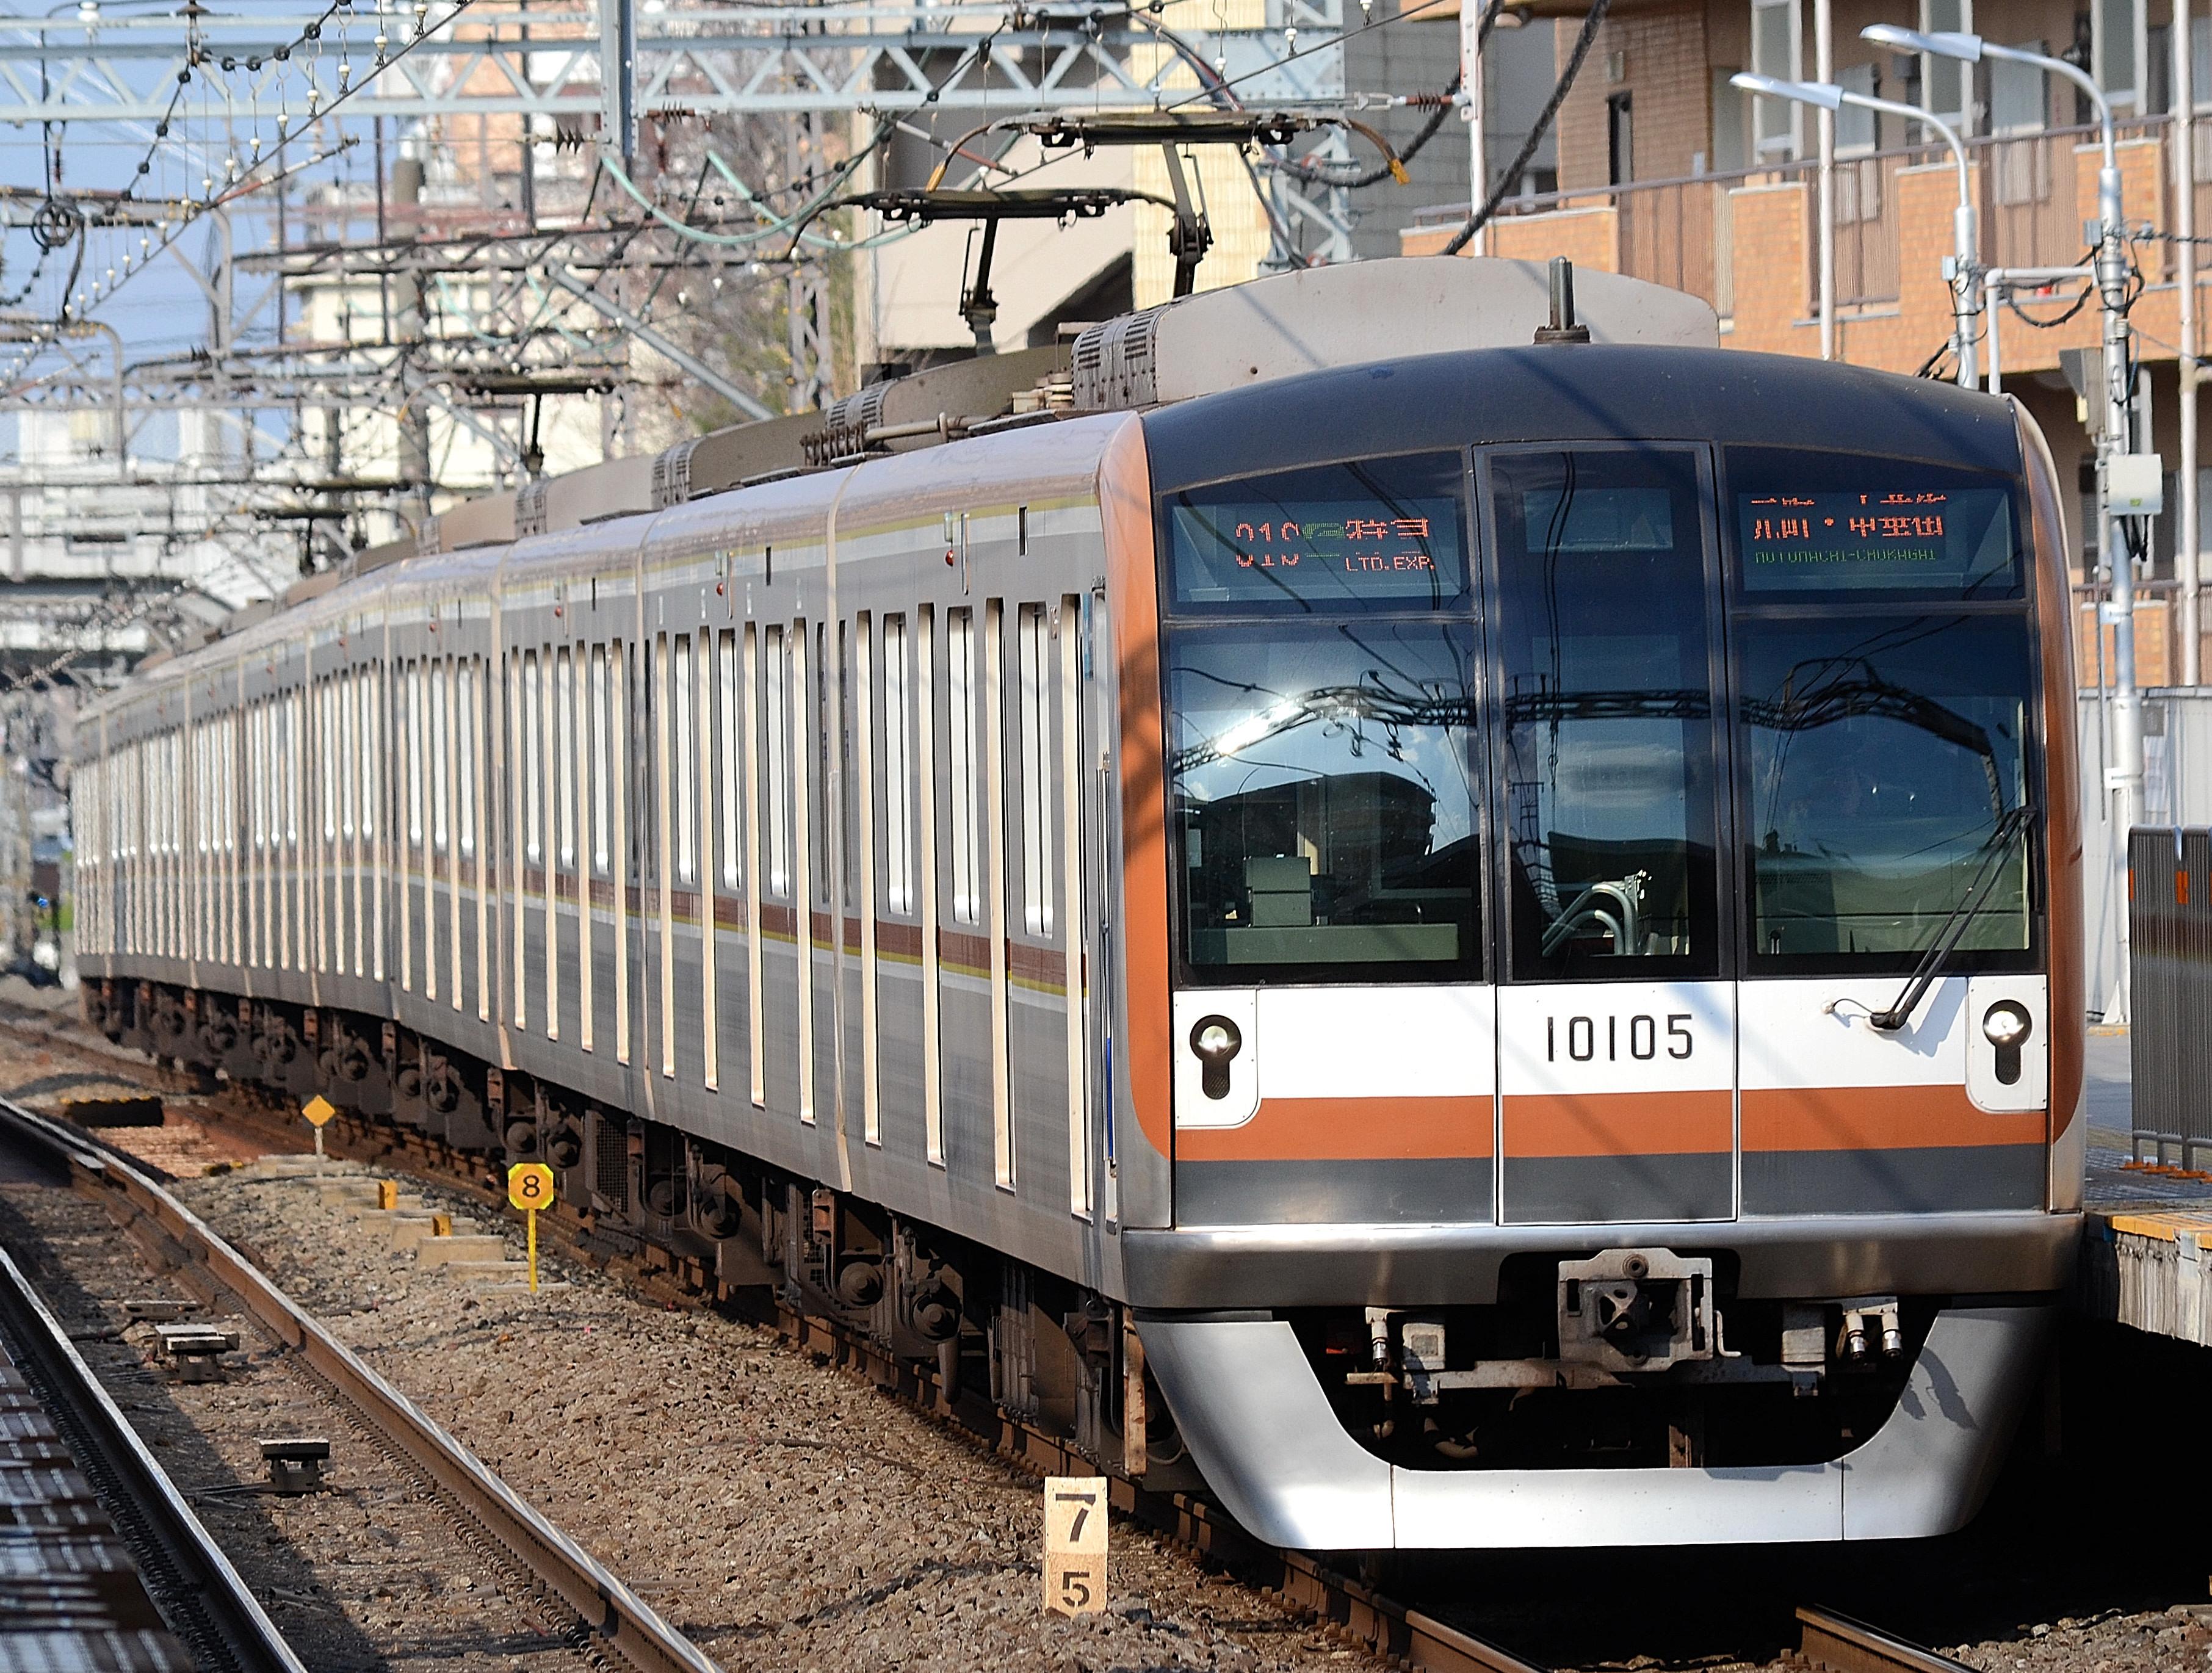 Tokyo Metro 10000 seriesOh no, there's been an error